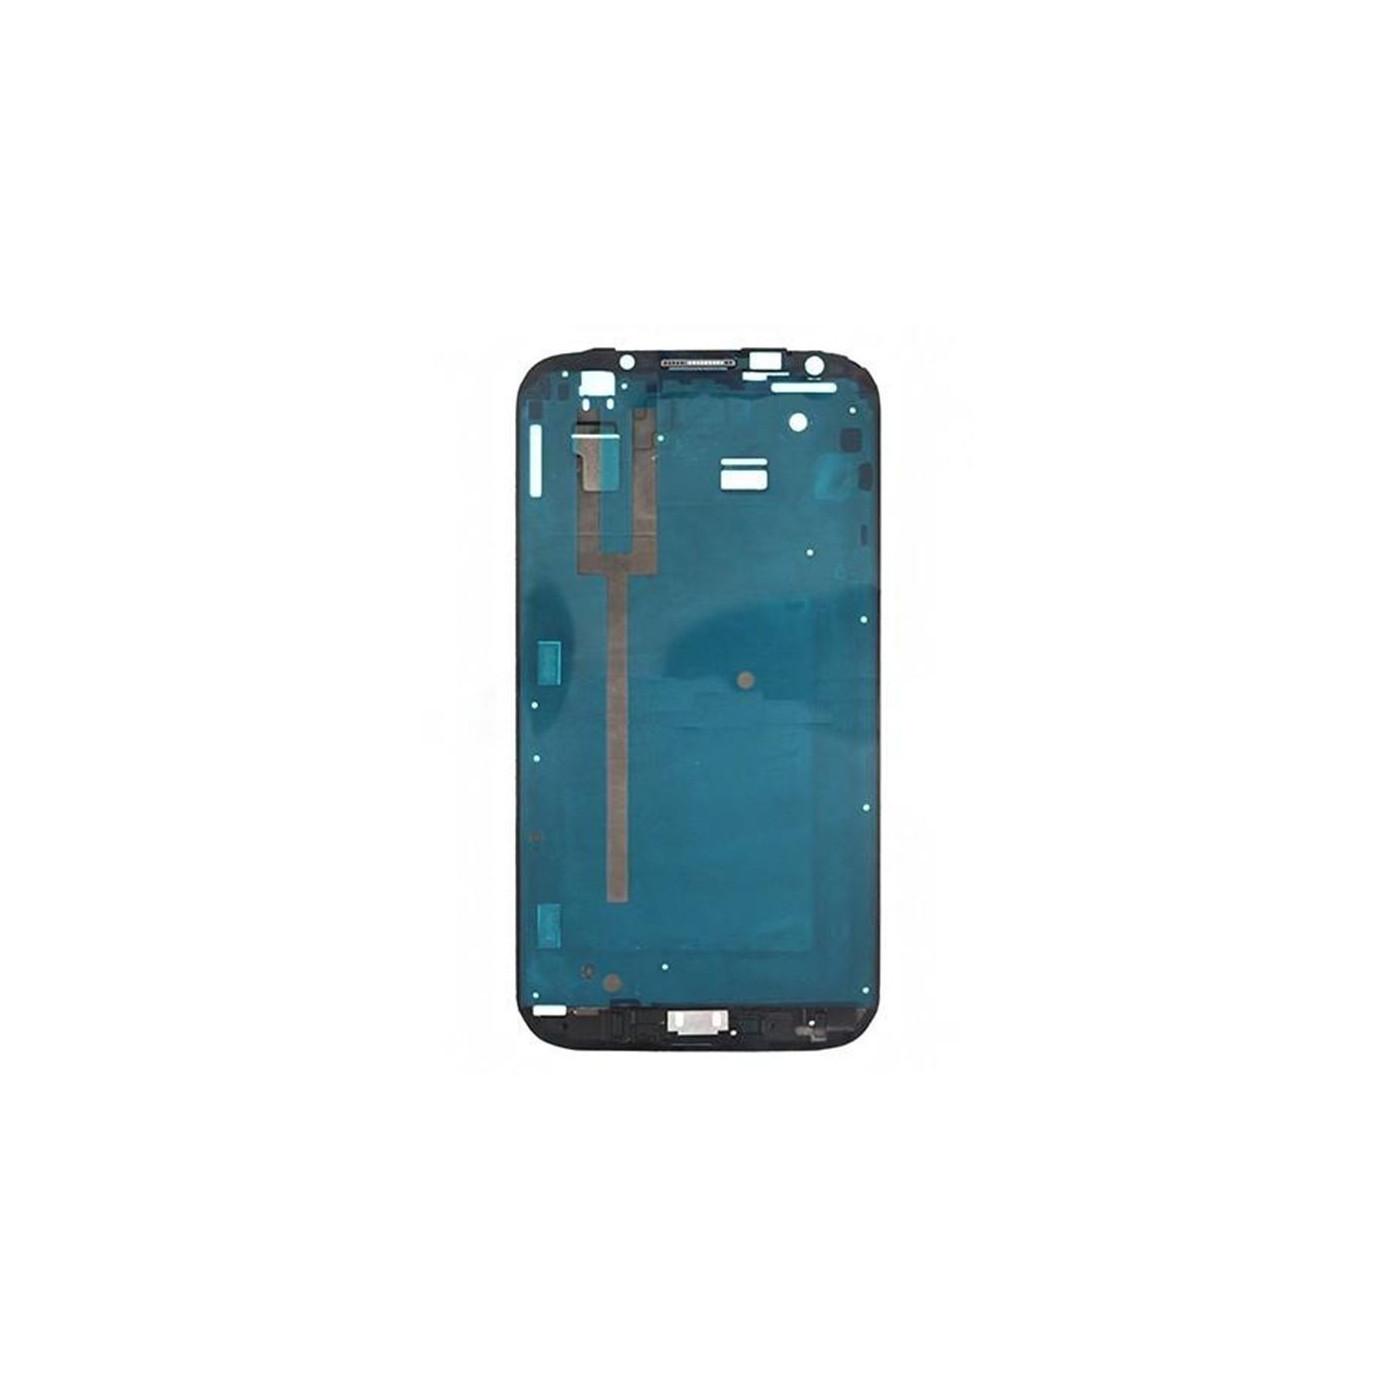 Rahmen Rahmen Körper Samsung Galaxy Note II N7100 Silber Center Frame